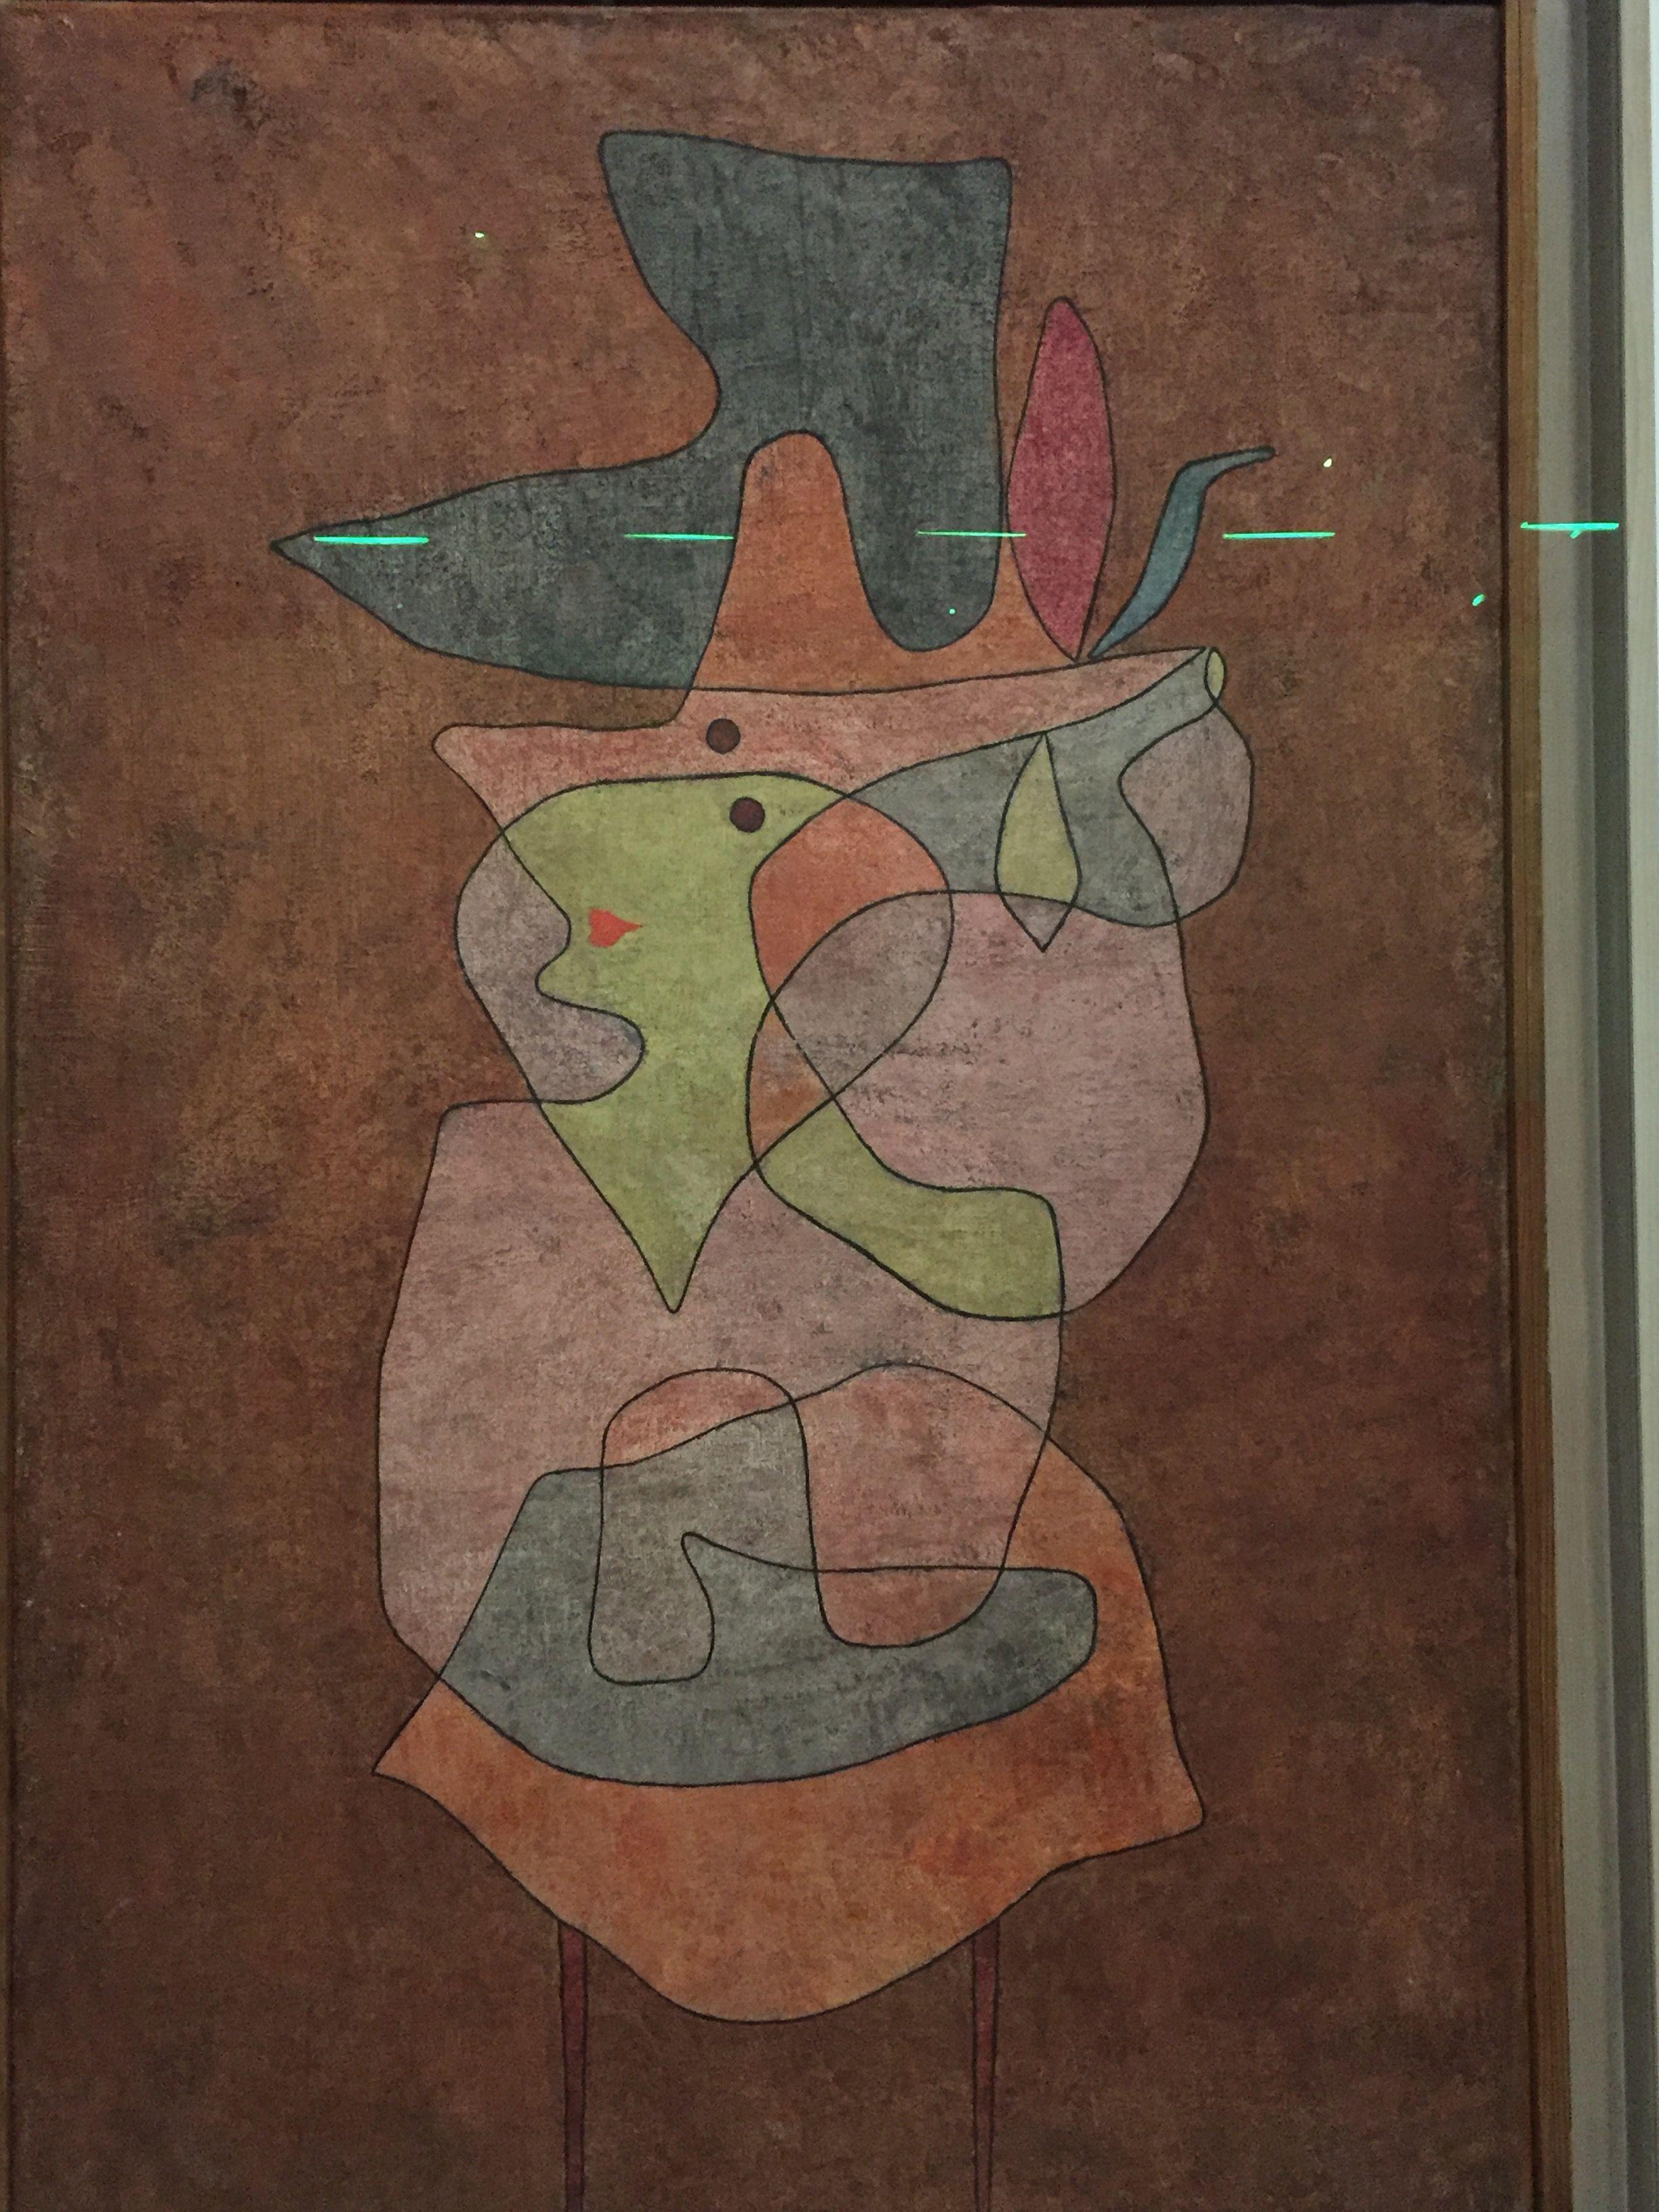 Watercolor art history - Explore Paul Klee Art History News And More